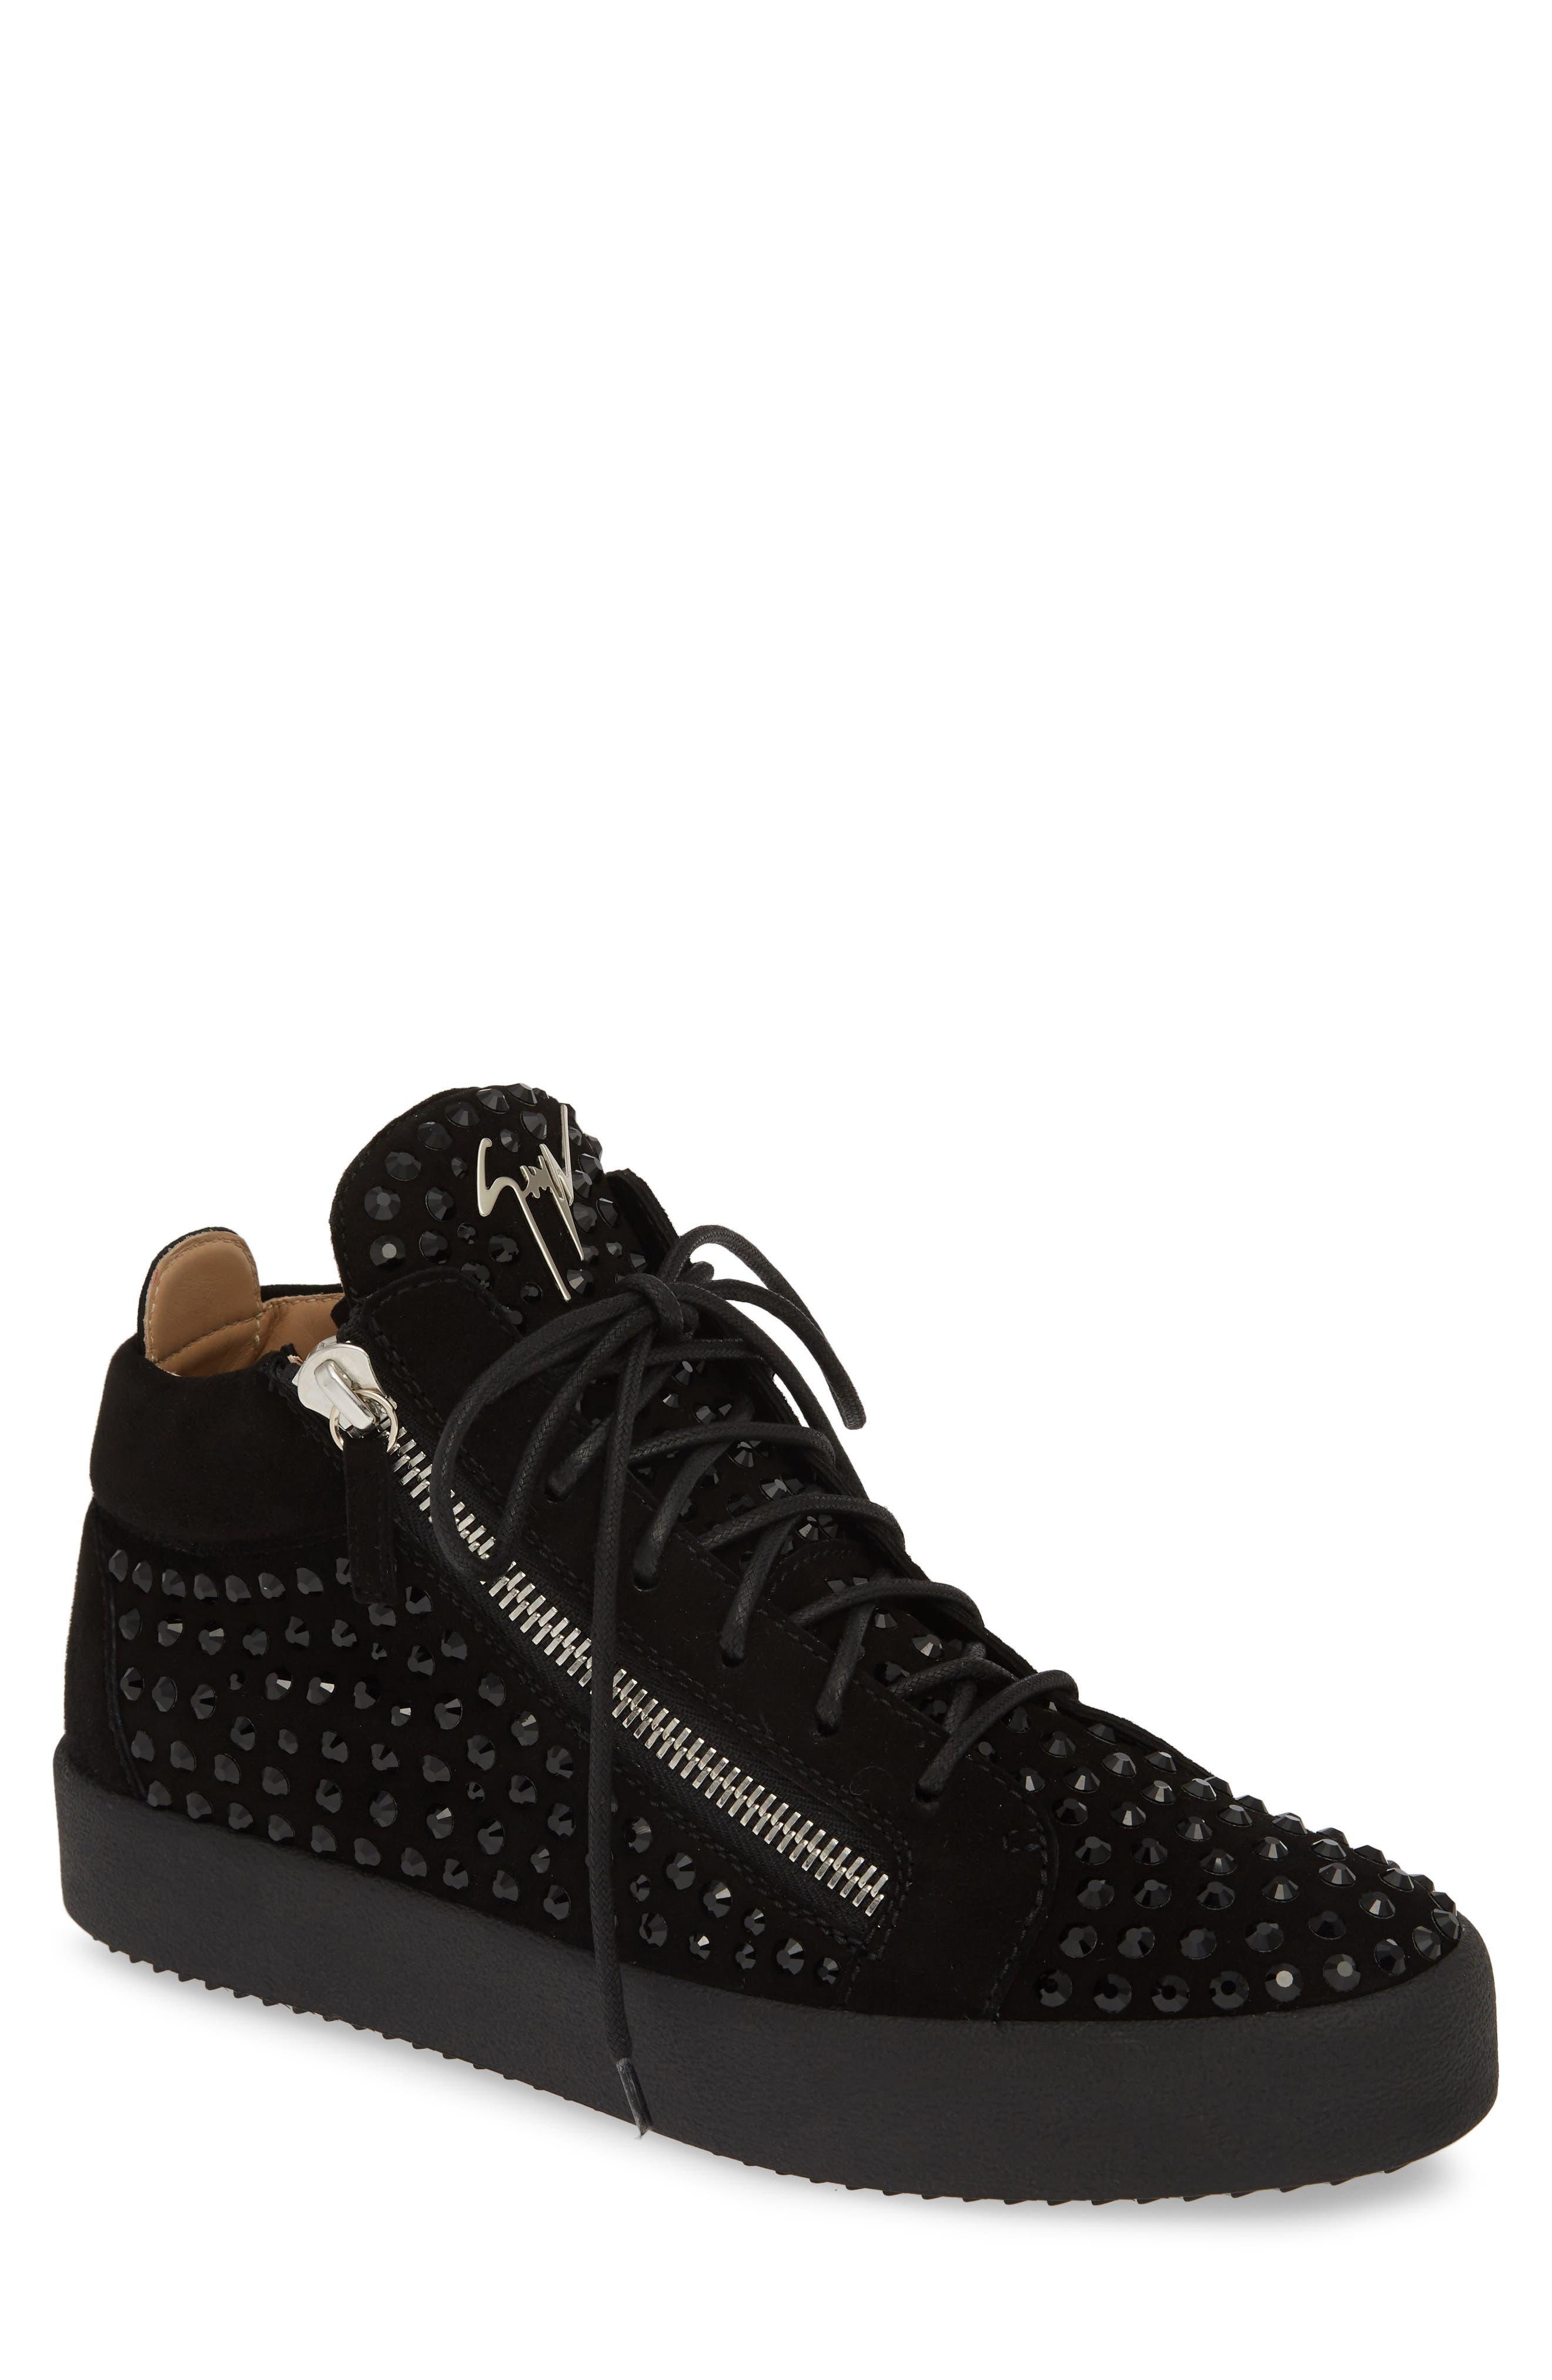 5ba9772469918 Giuseppe Zanotti - Men's Casual Fashion Shoes and Sneakers